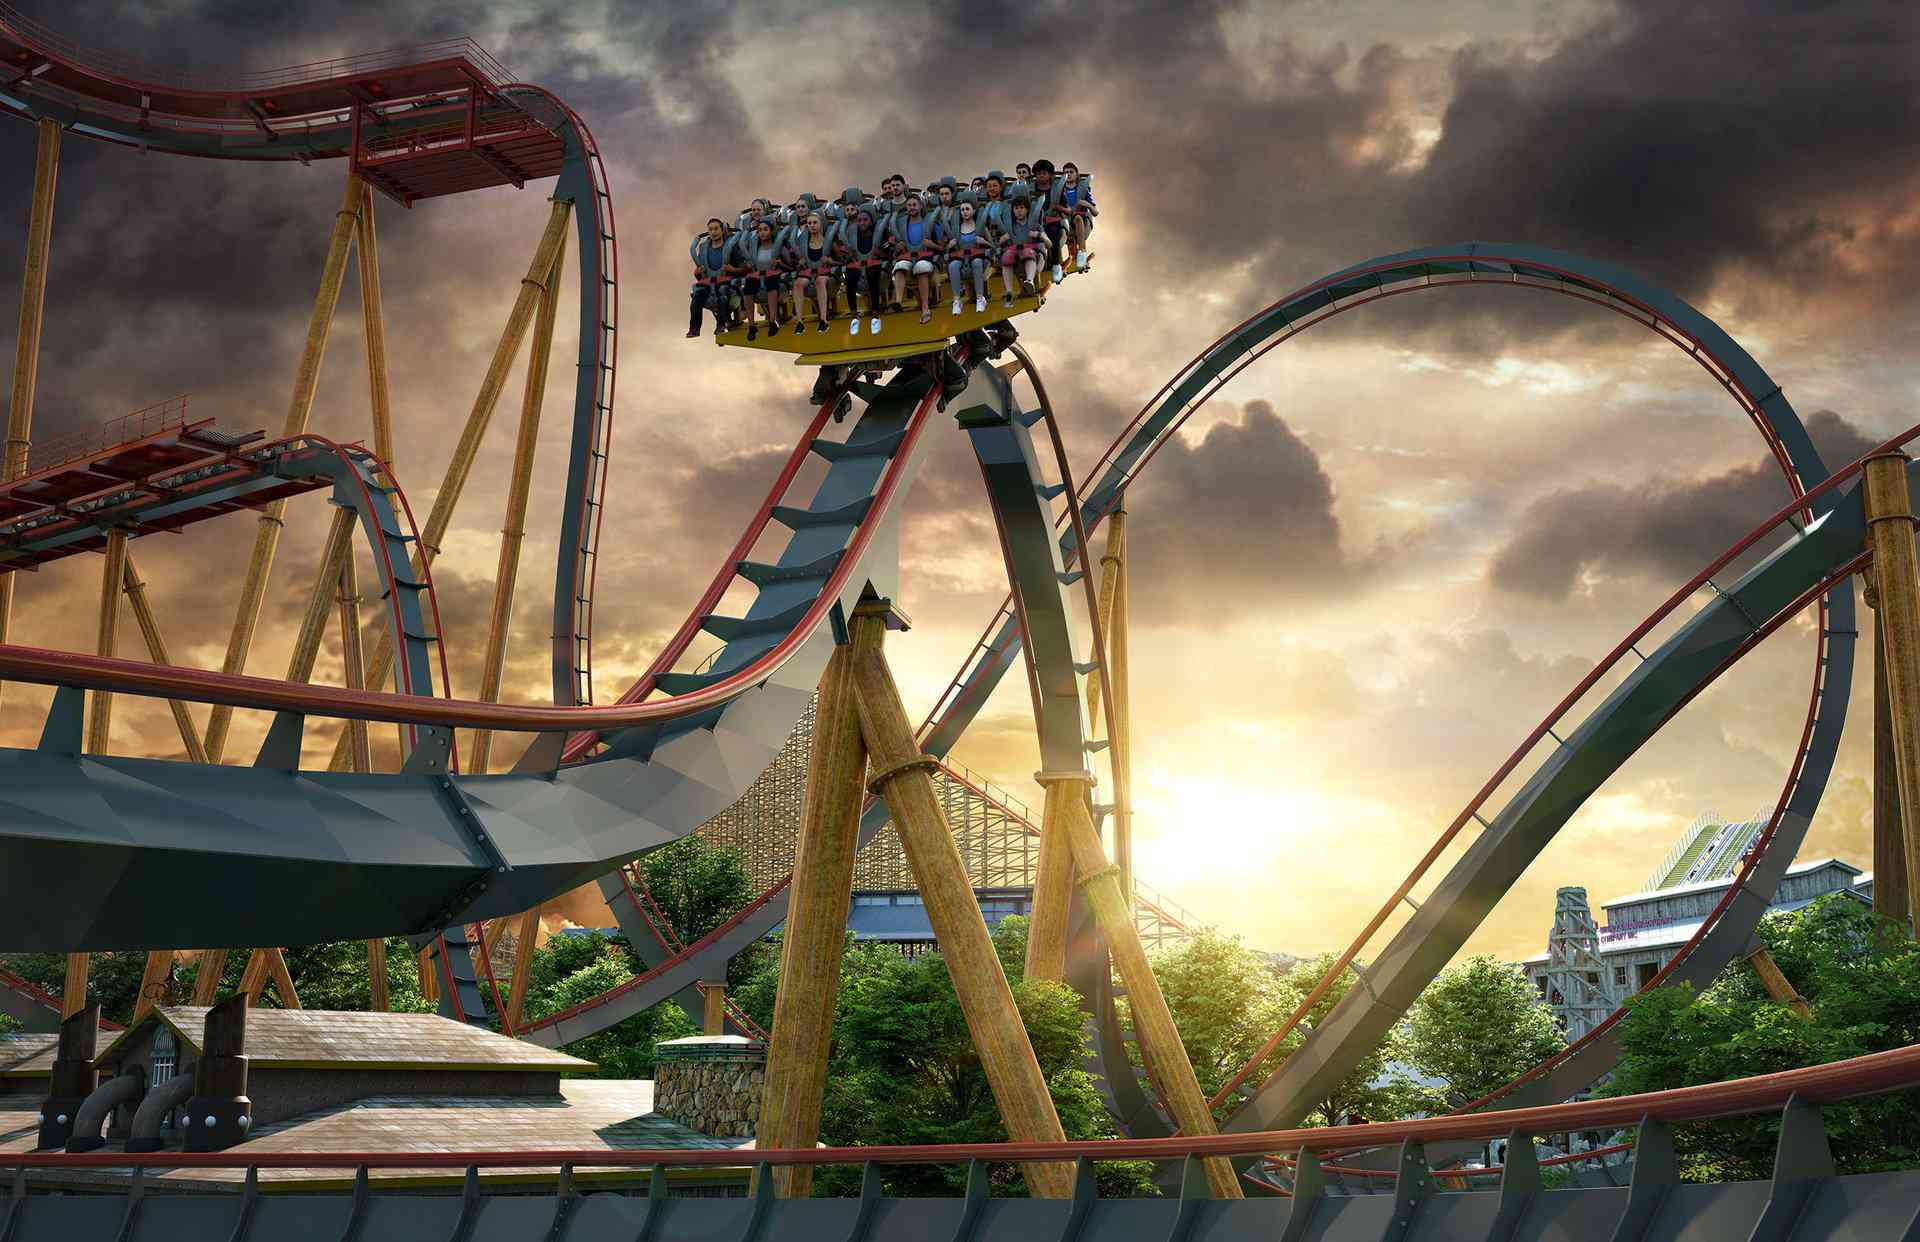 Cliffhanger coaster at Six Flags Fiesta Texas